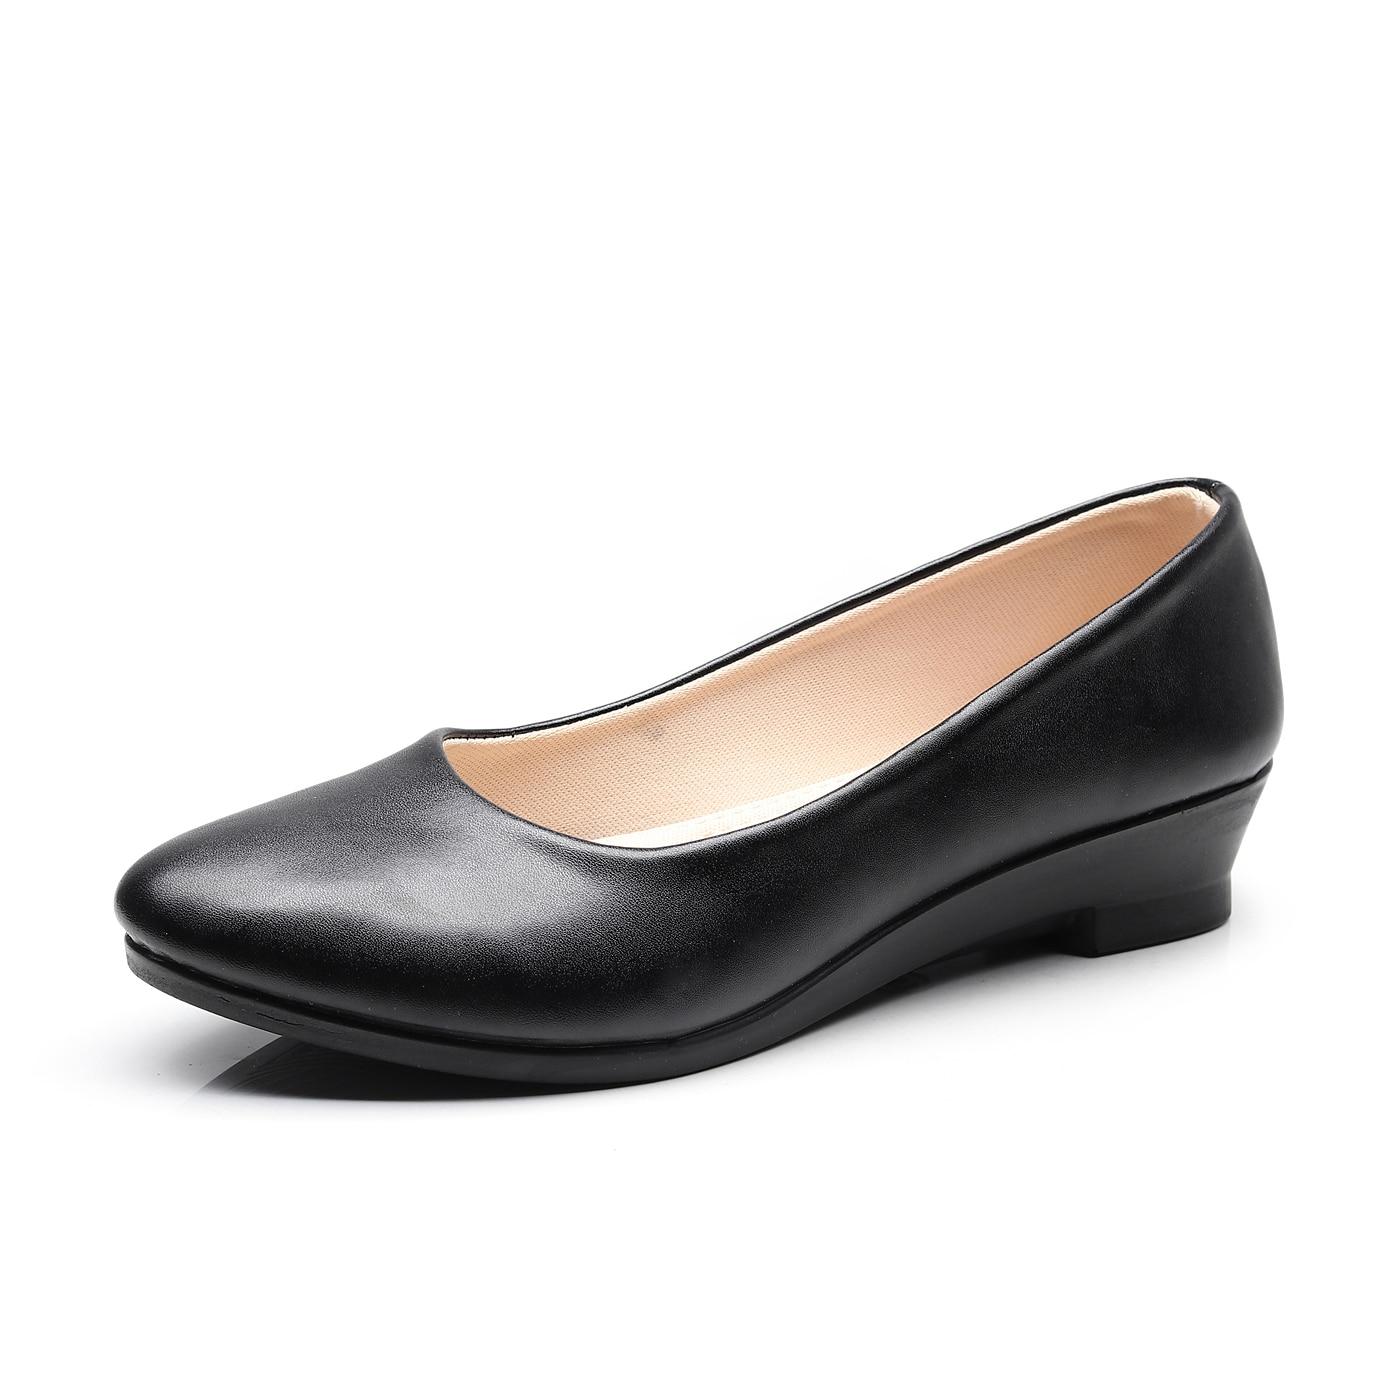 Women's Shoes Dynamic Kangol Bertha Slip On Ballet Pumps Shoes Womens Black Footwear